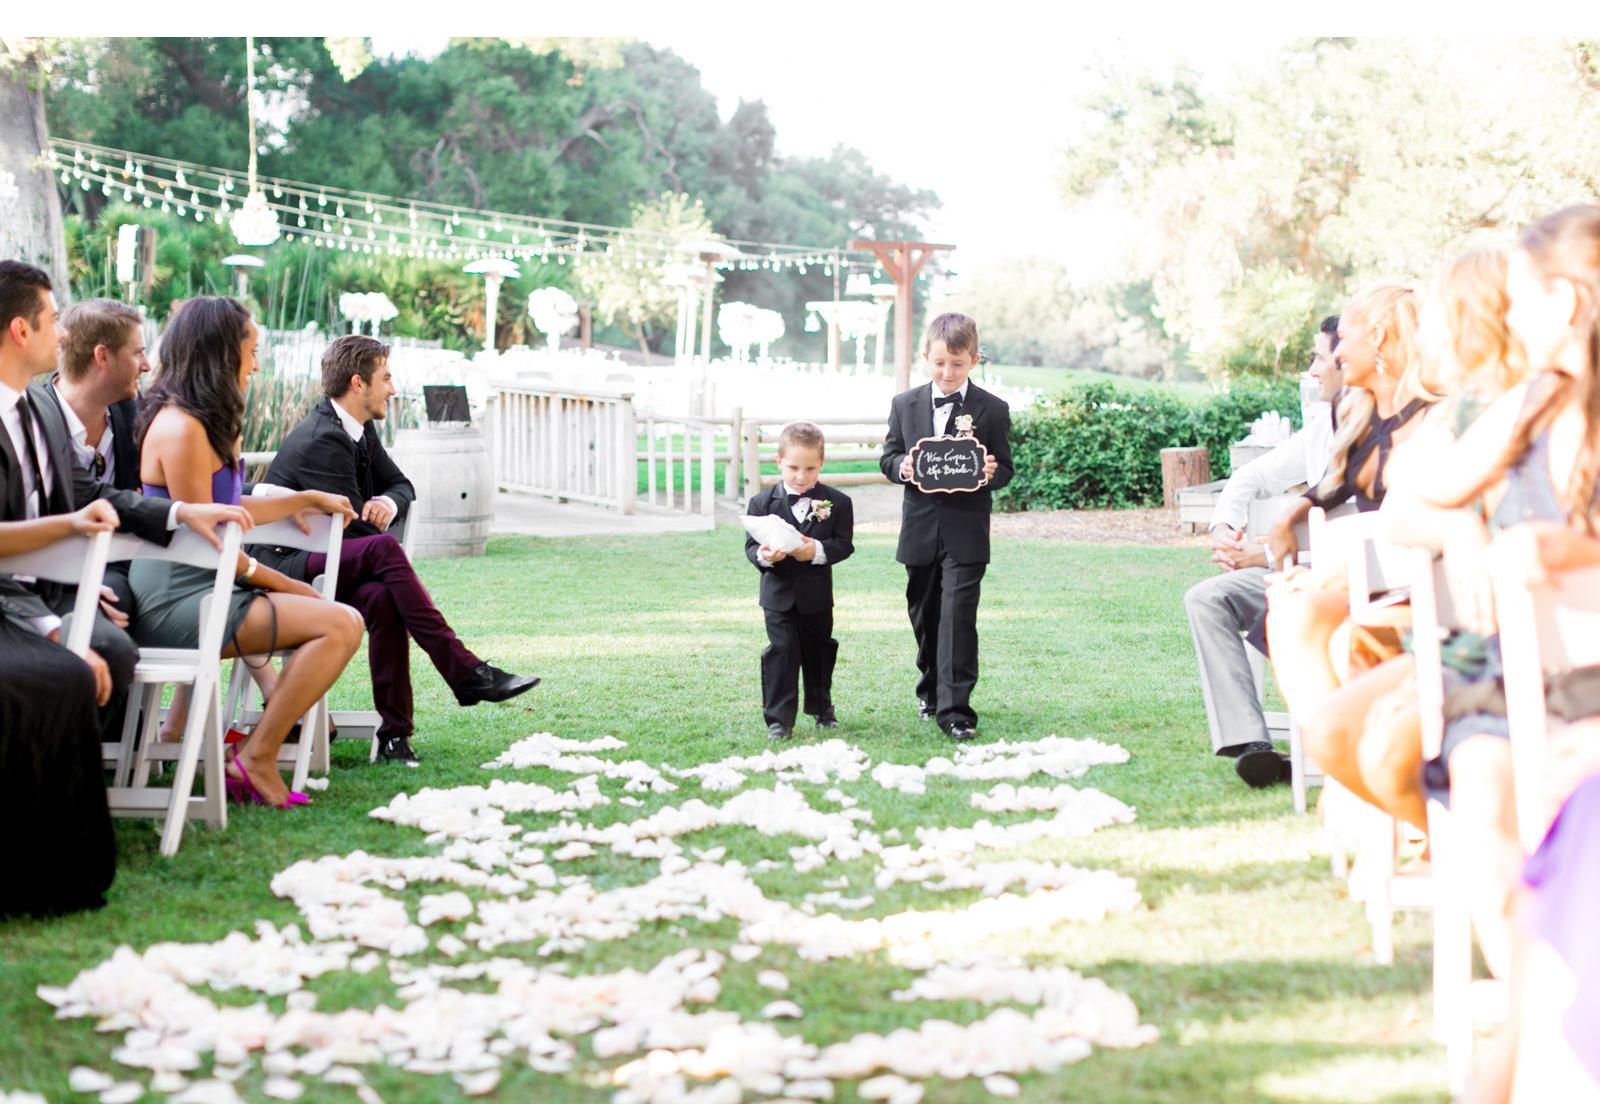 Nia-Sanchez-Wedding-Natalie-Schutt-Photography_05.jpg